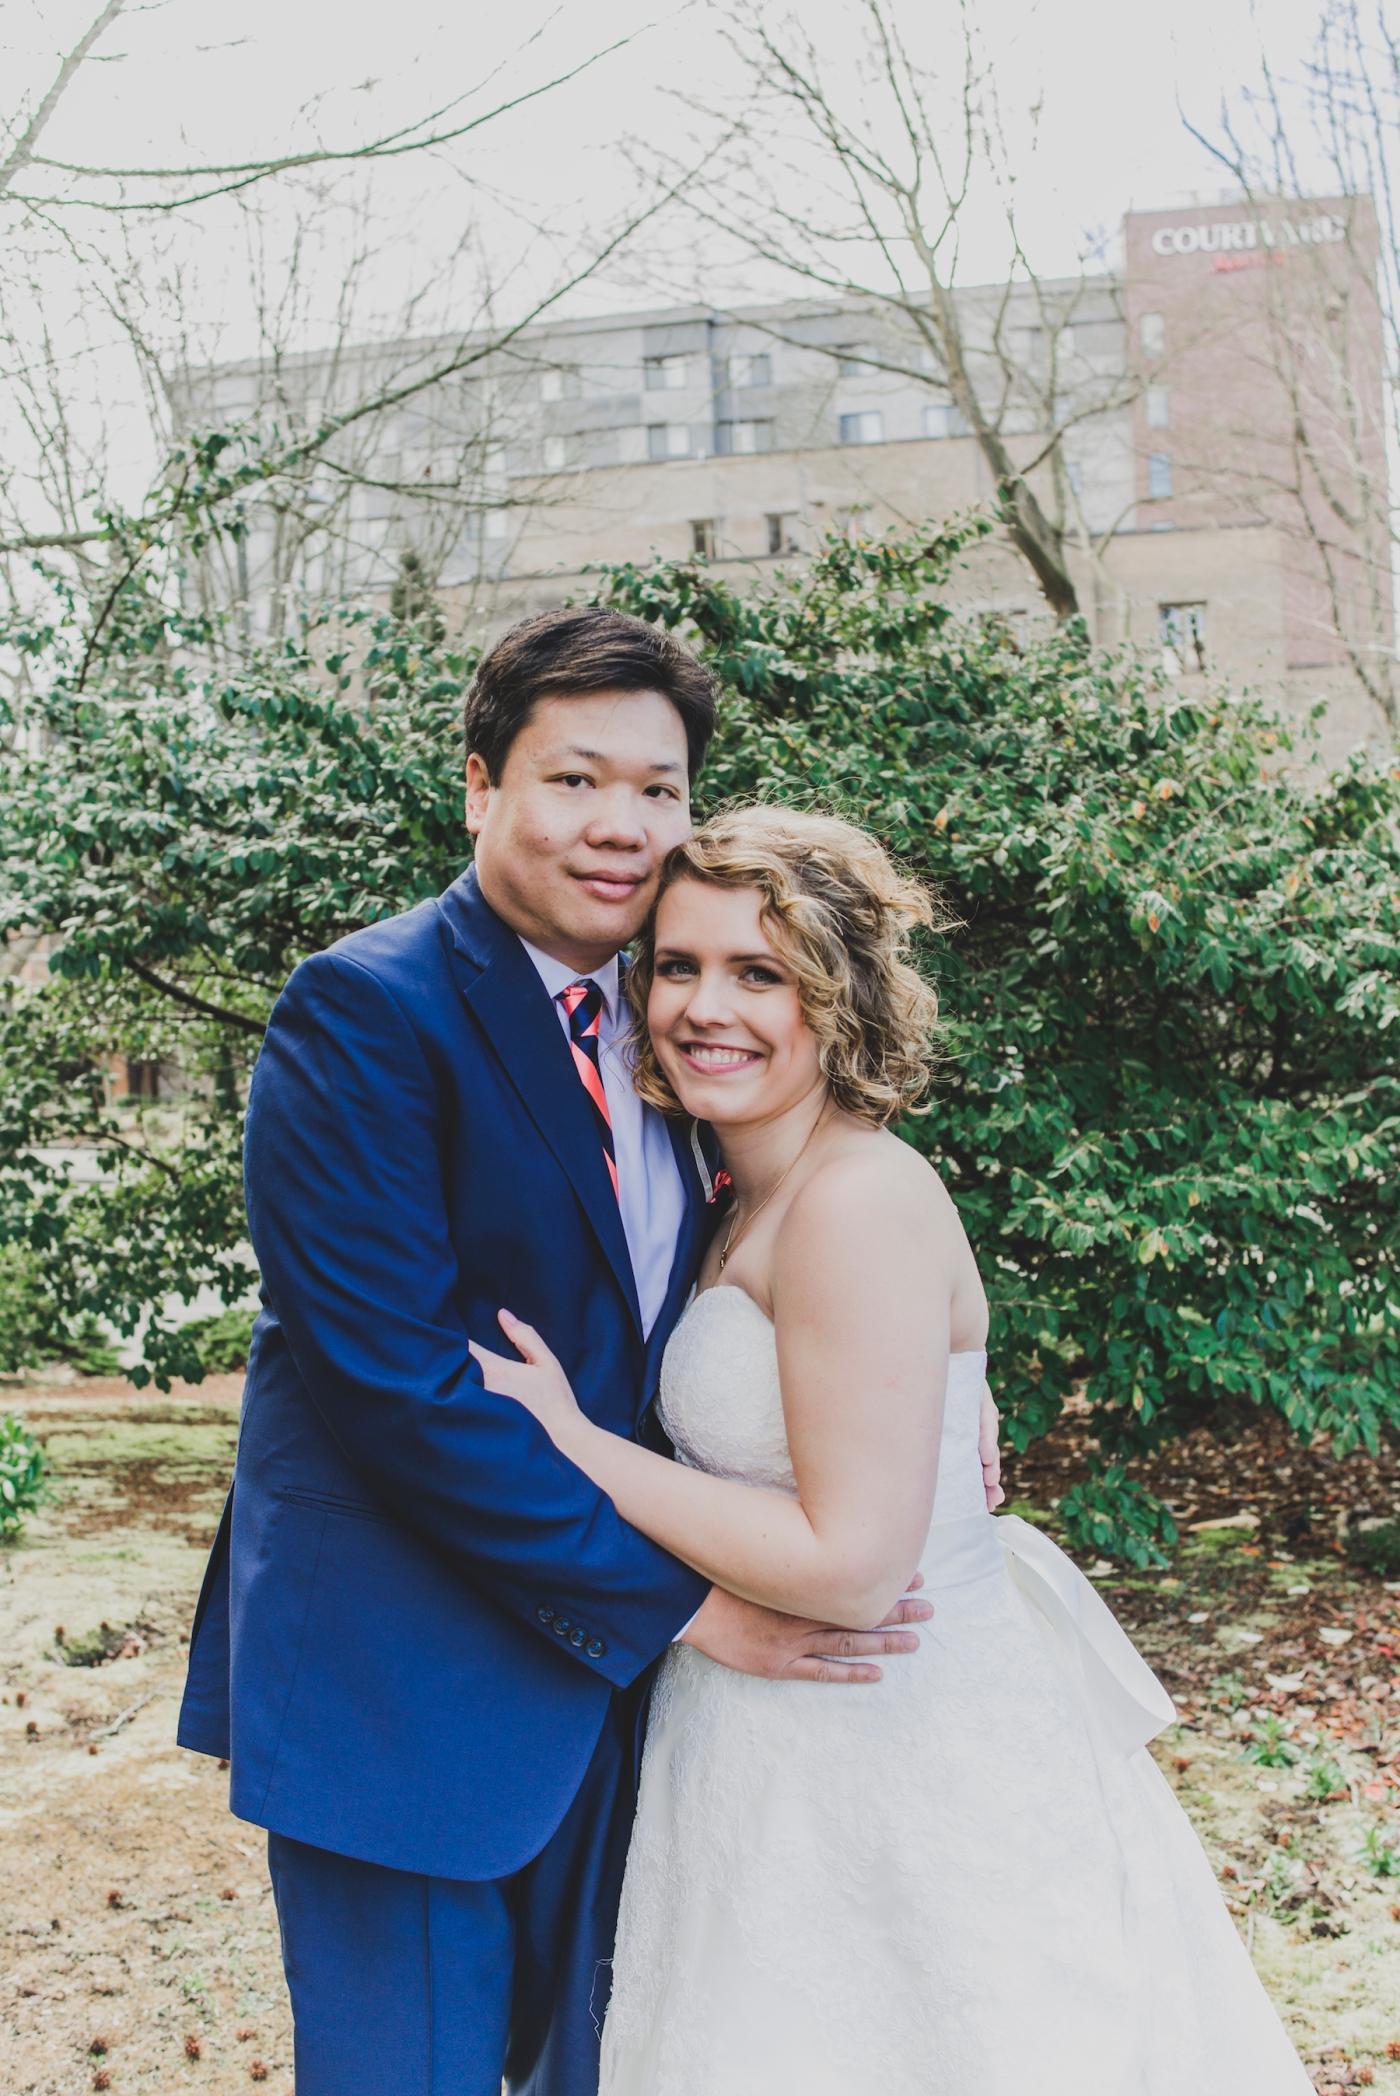 DSC_2325Everett_Wedding_Ballroom_Jane_Speleers_photography_Rachel_and_Edmund_Bridesmaids_peach_dresses_groomsmen_2017